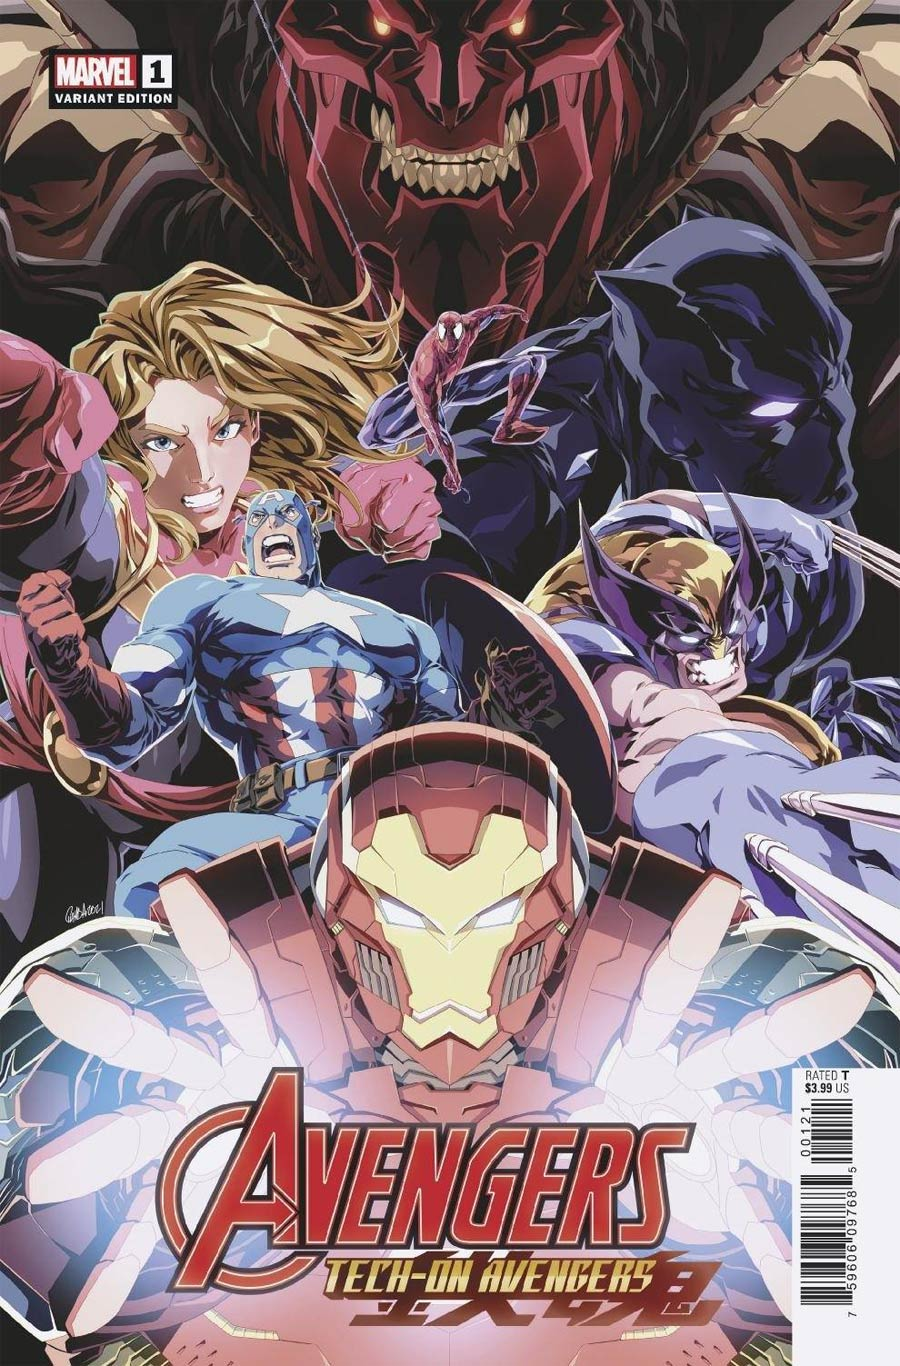 Avengers Tech-On Avengers #1 Cover B Variant Jeff Chamba Cruz Cover